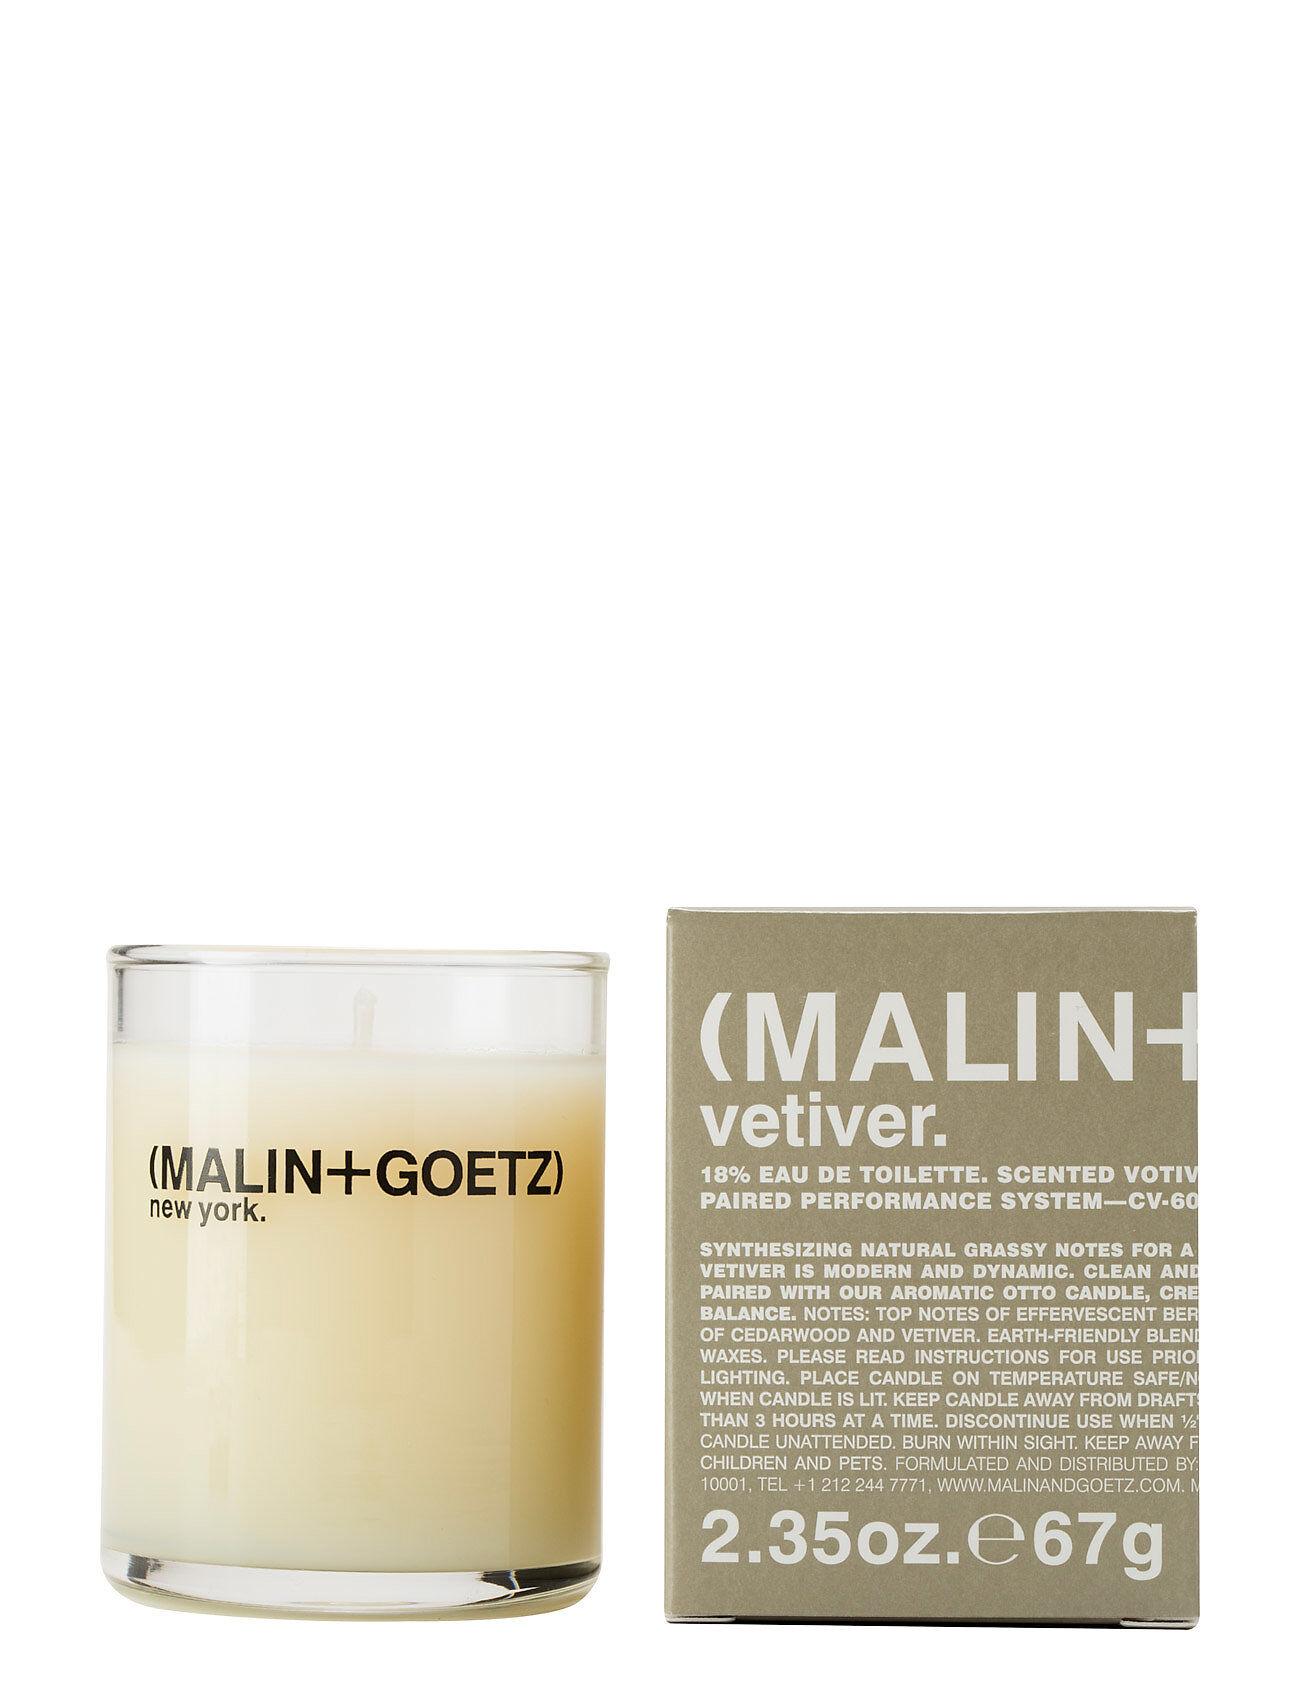 MALIN+GOETZ Vetiver Votive Candle Hajuvesi Parfyymi Nude MALIN+GOETZ